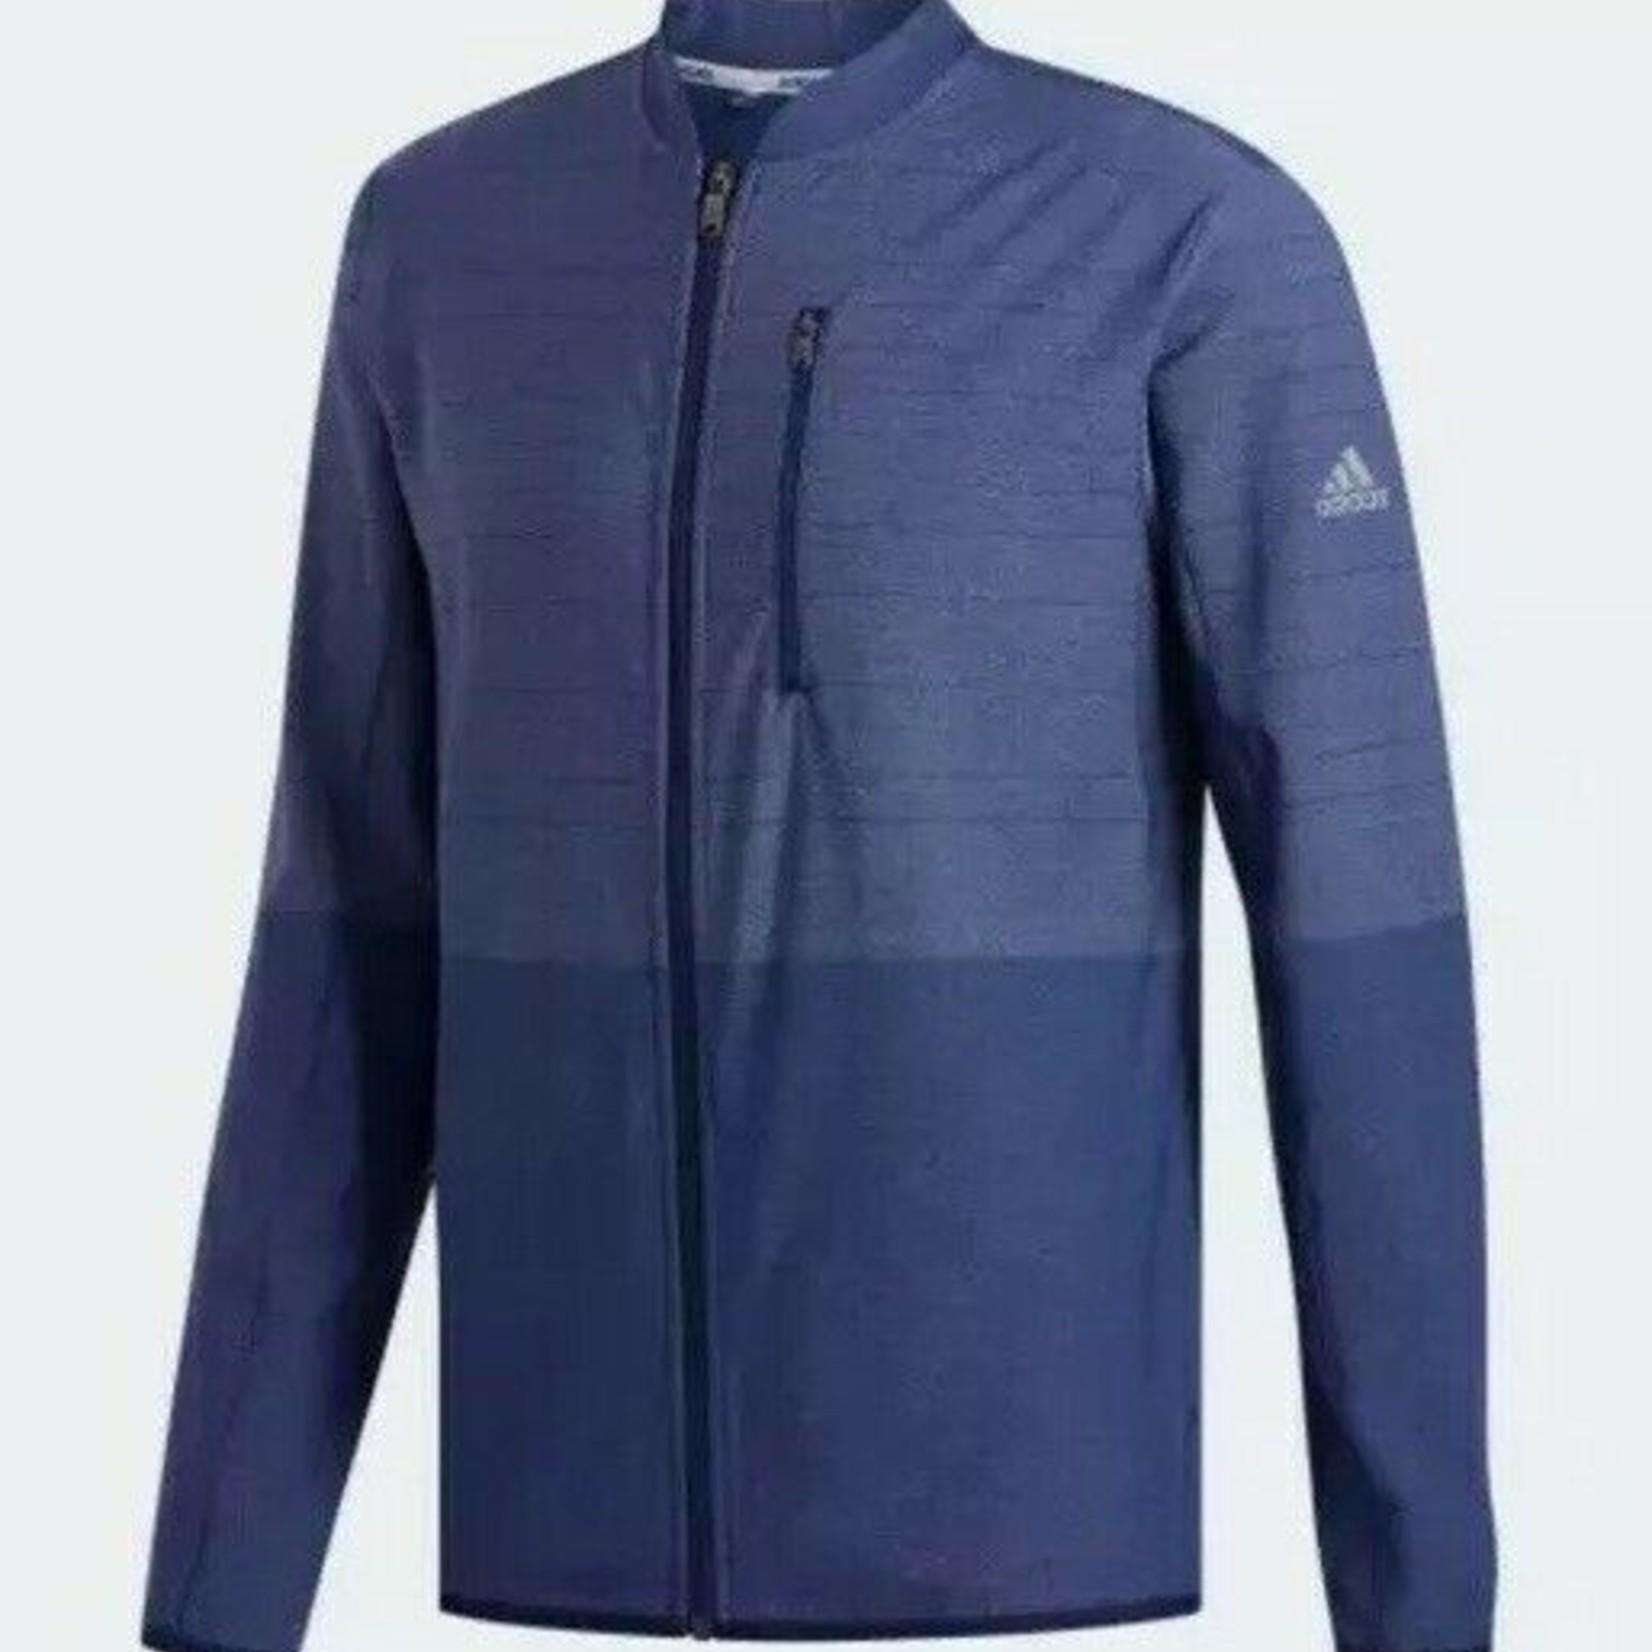 Adidas Adidas Men's Fut Crft Layering